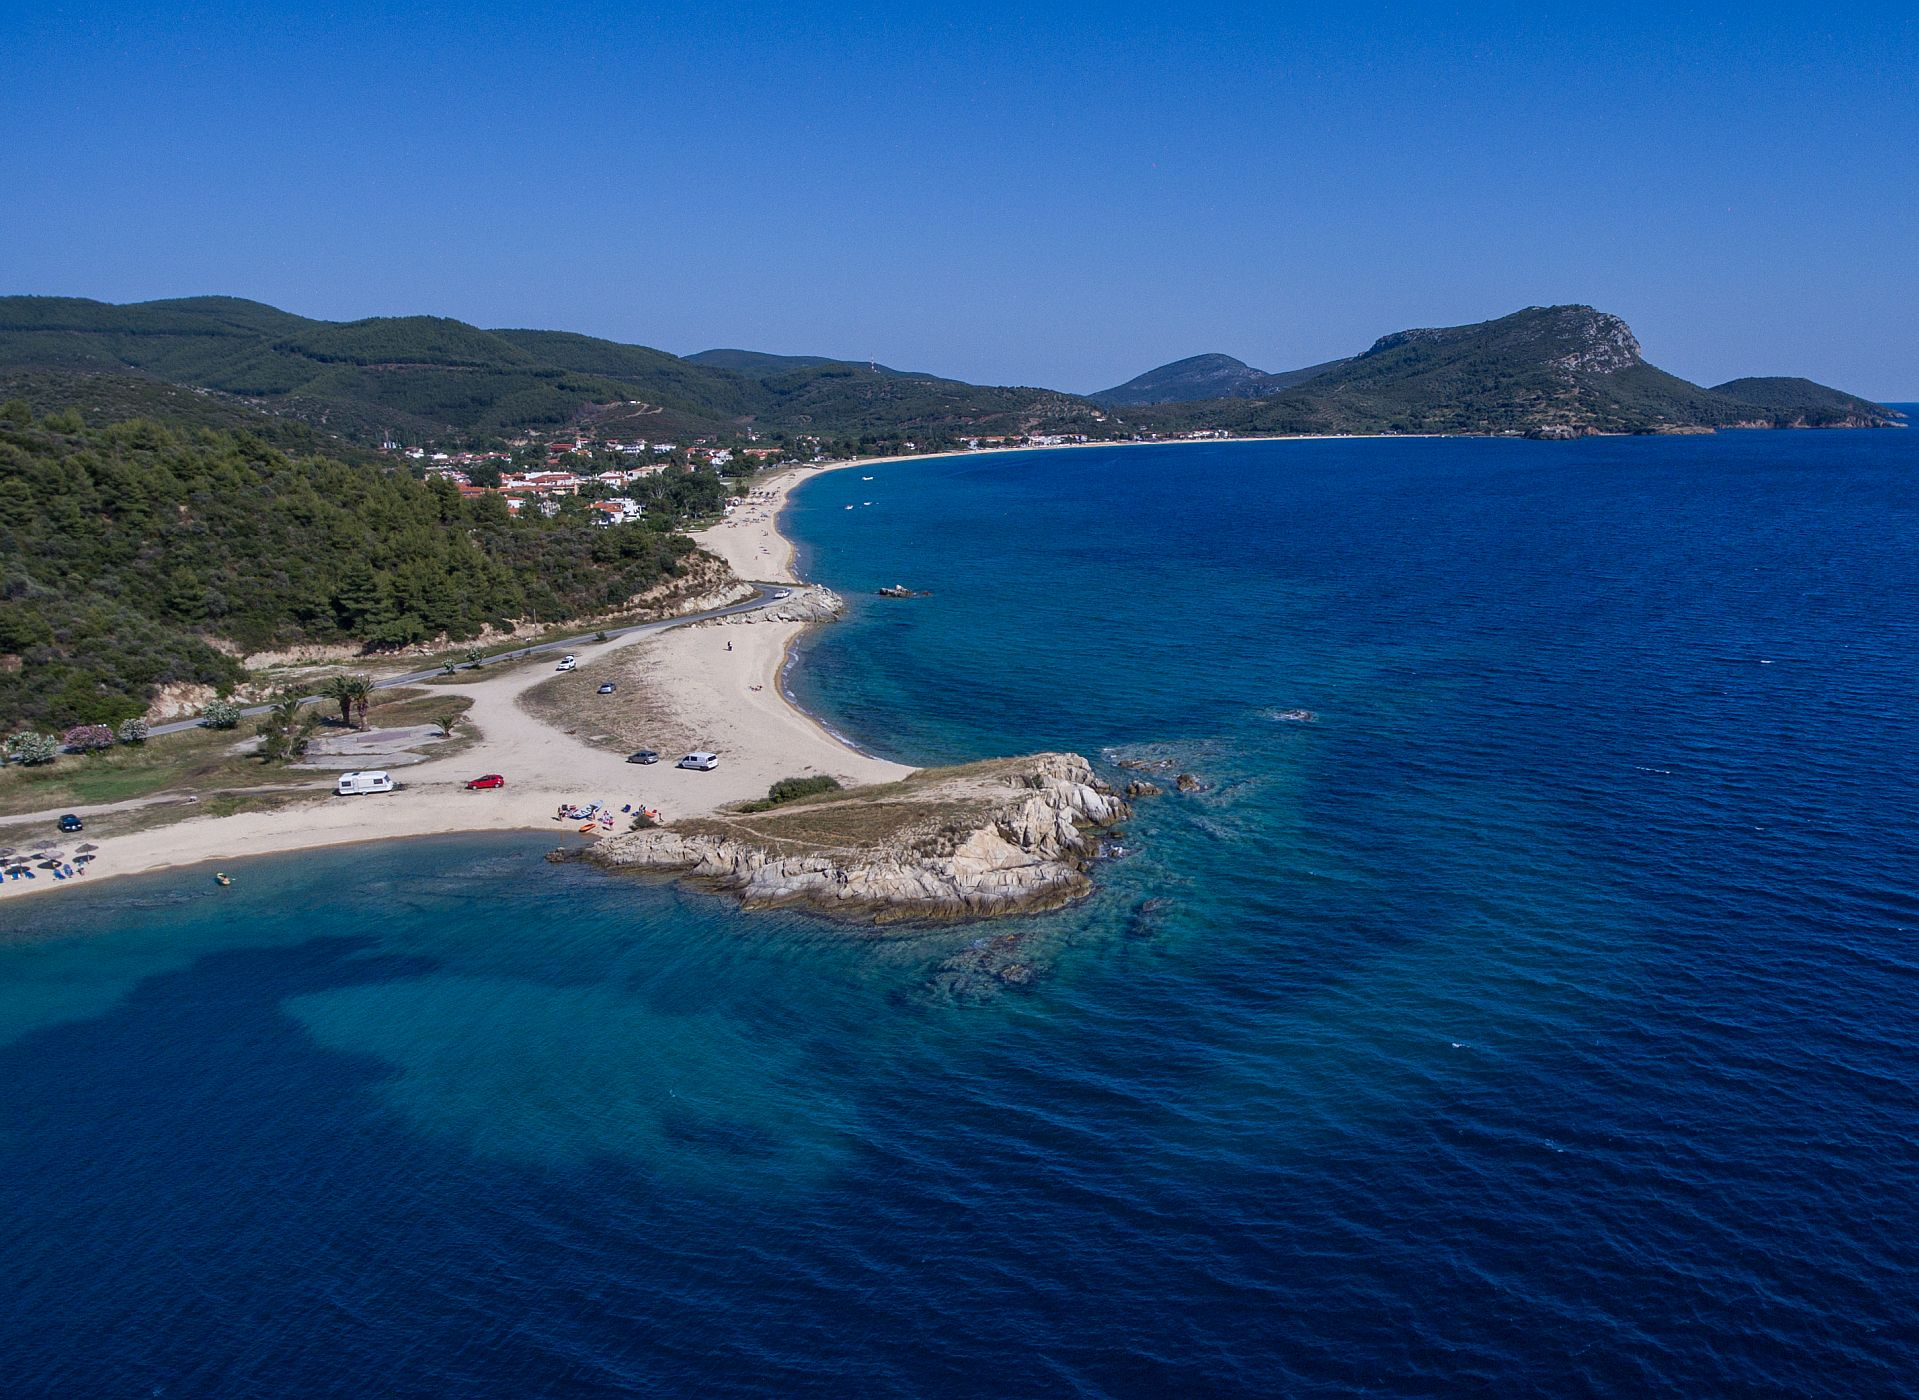 toroni halkidiki the beach